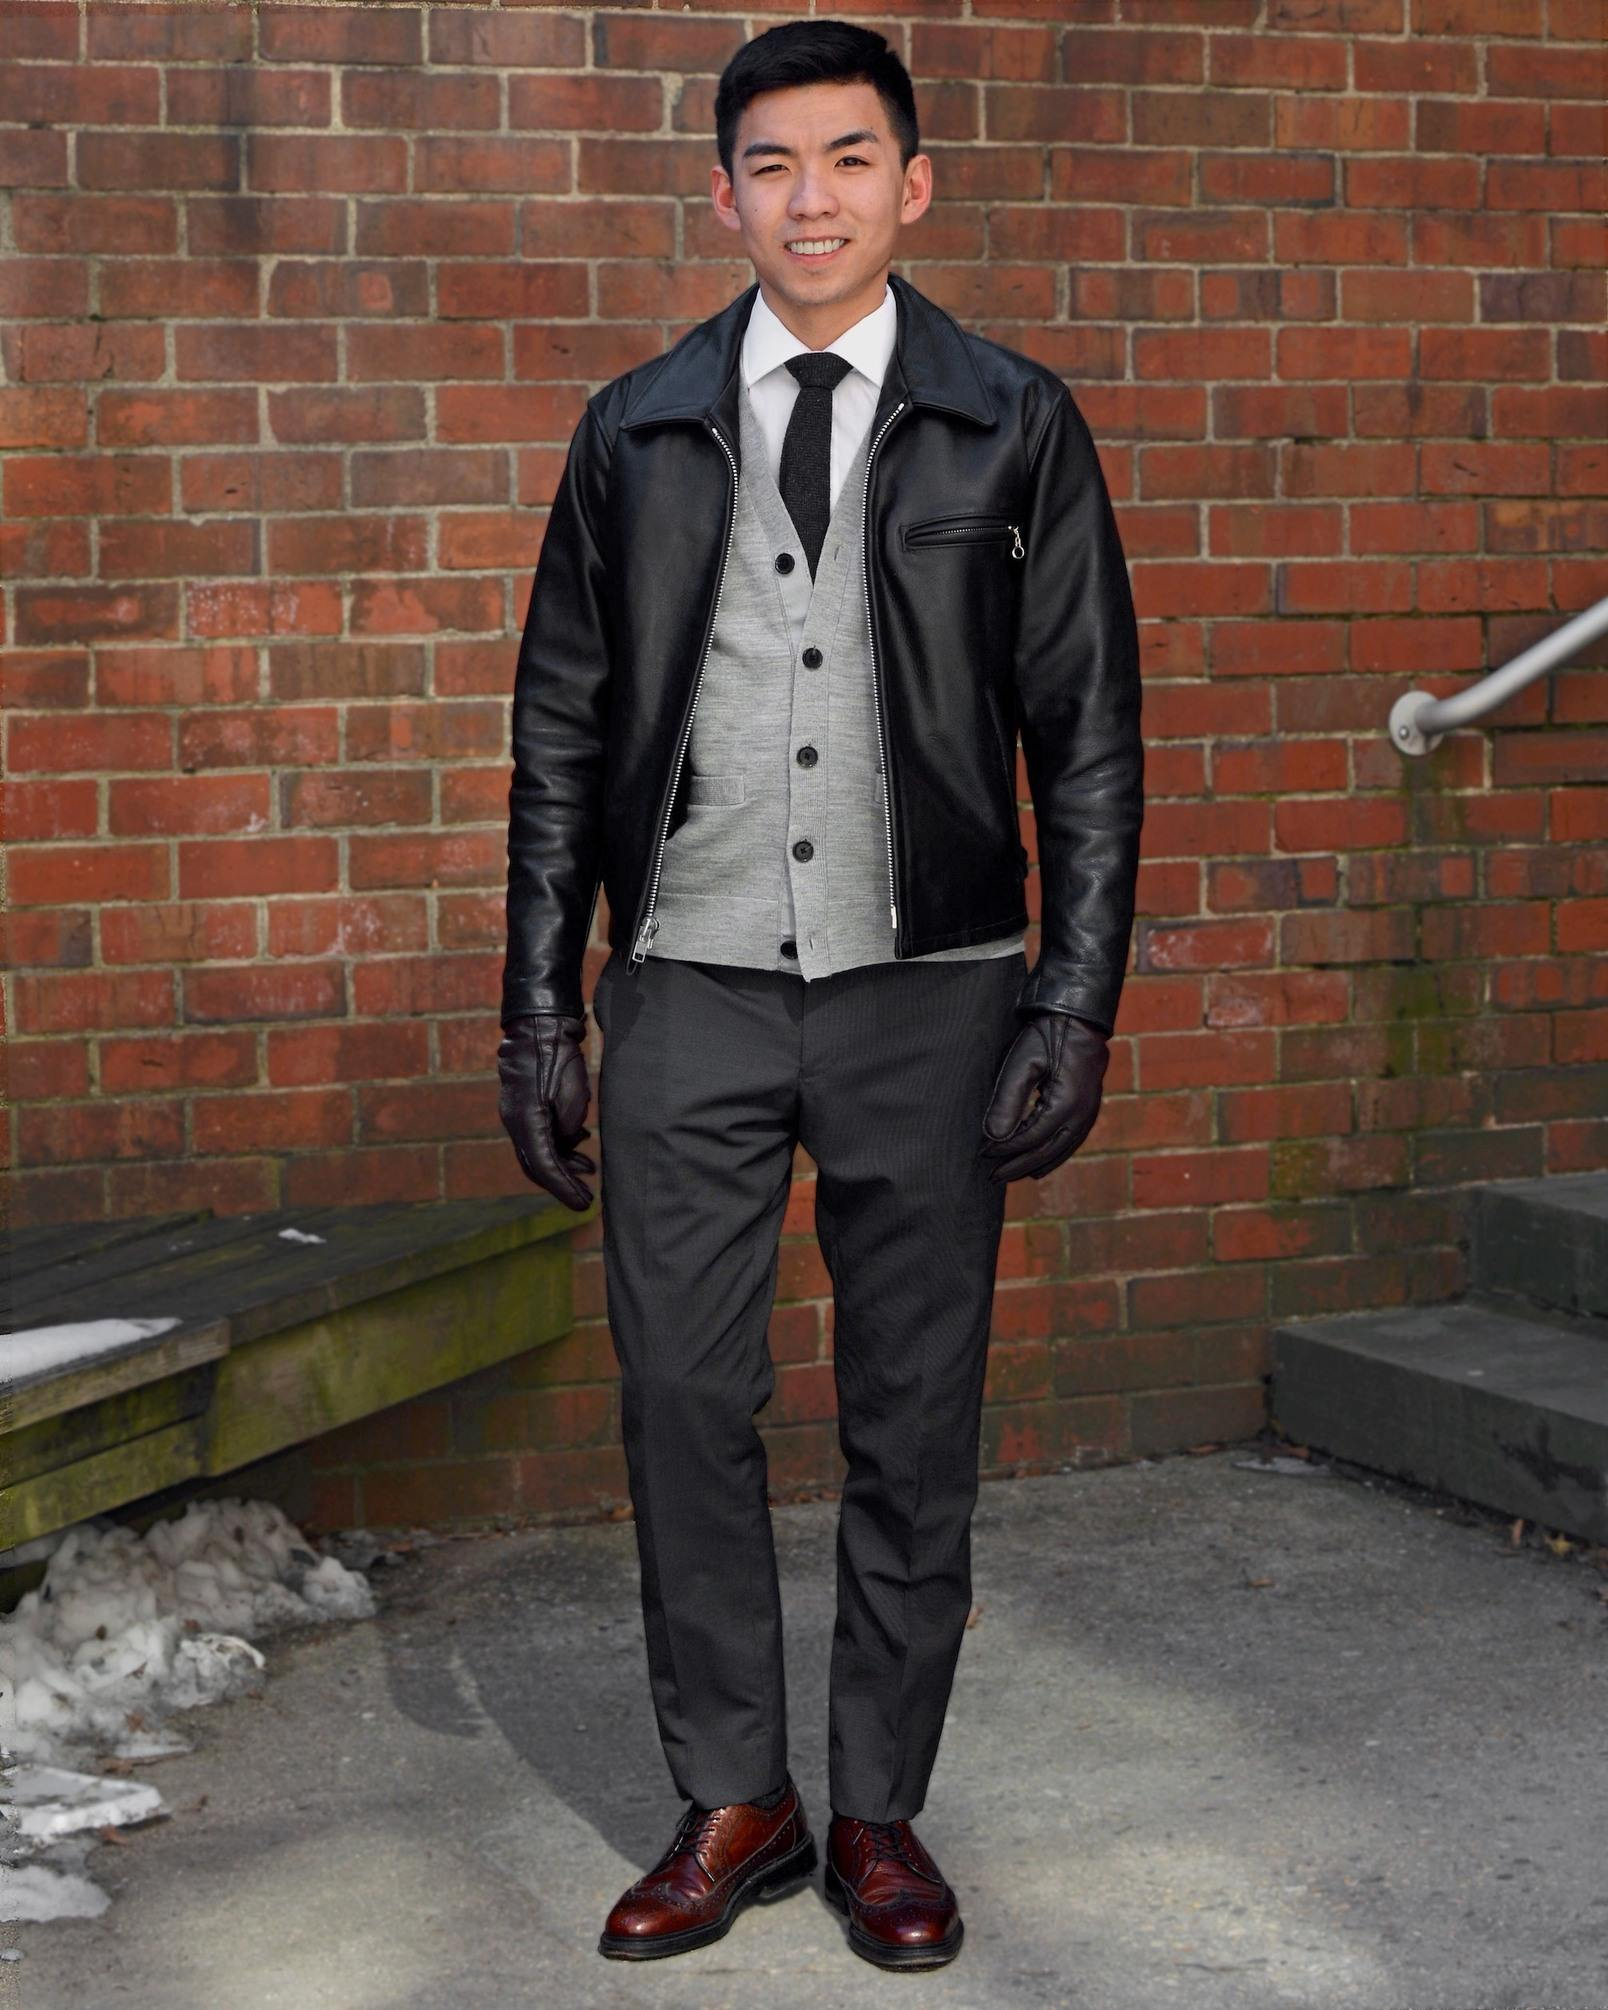 Humphrey Tsui in a black jacket